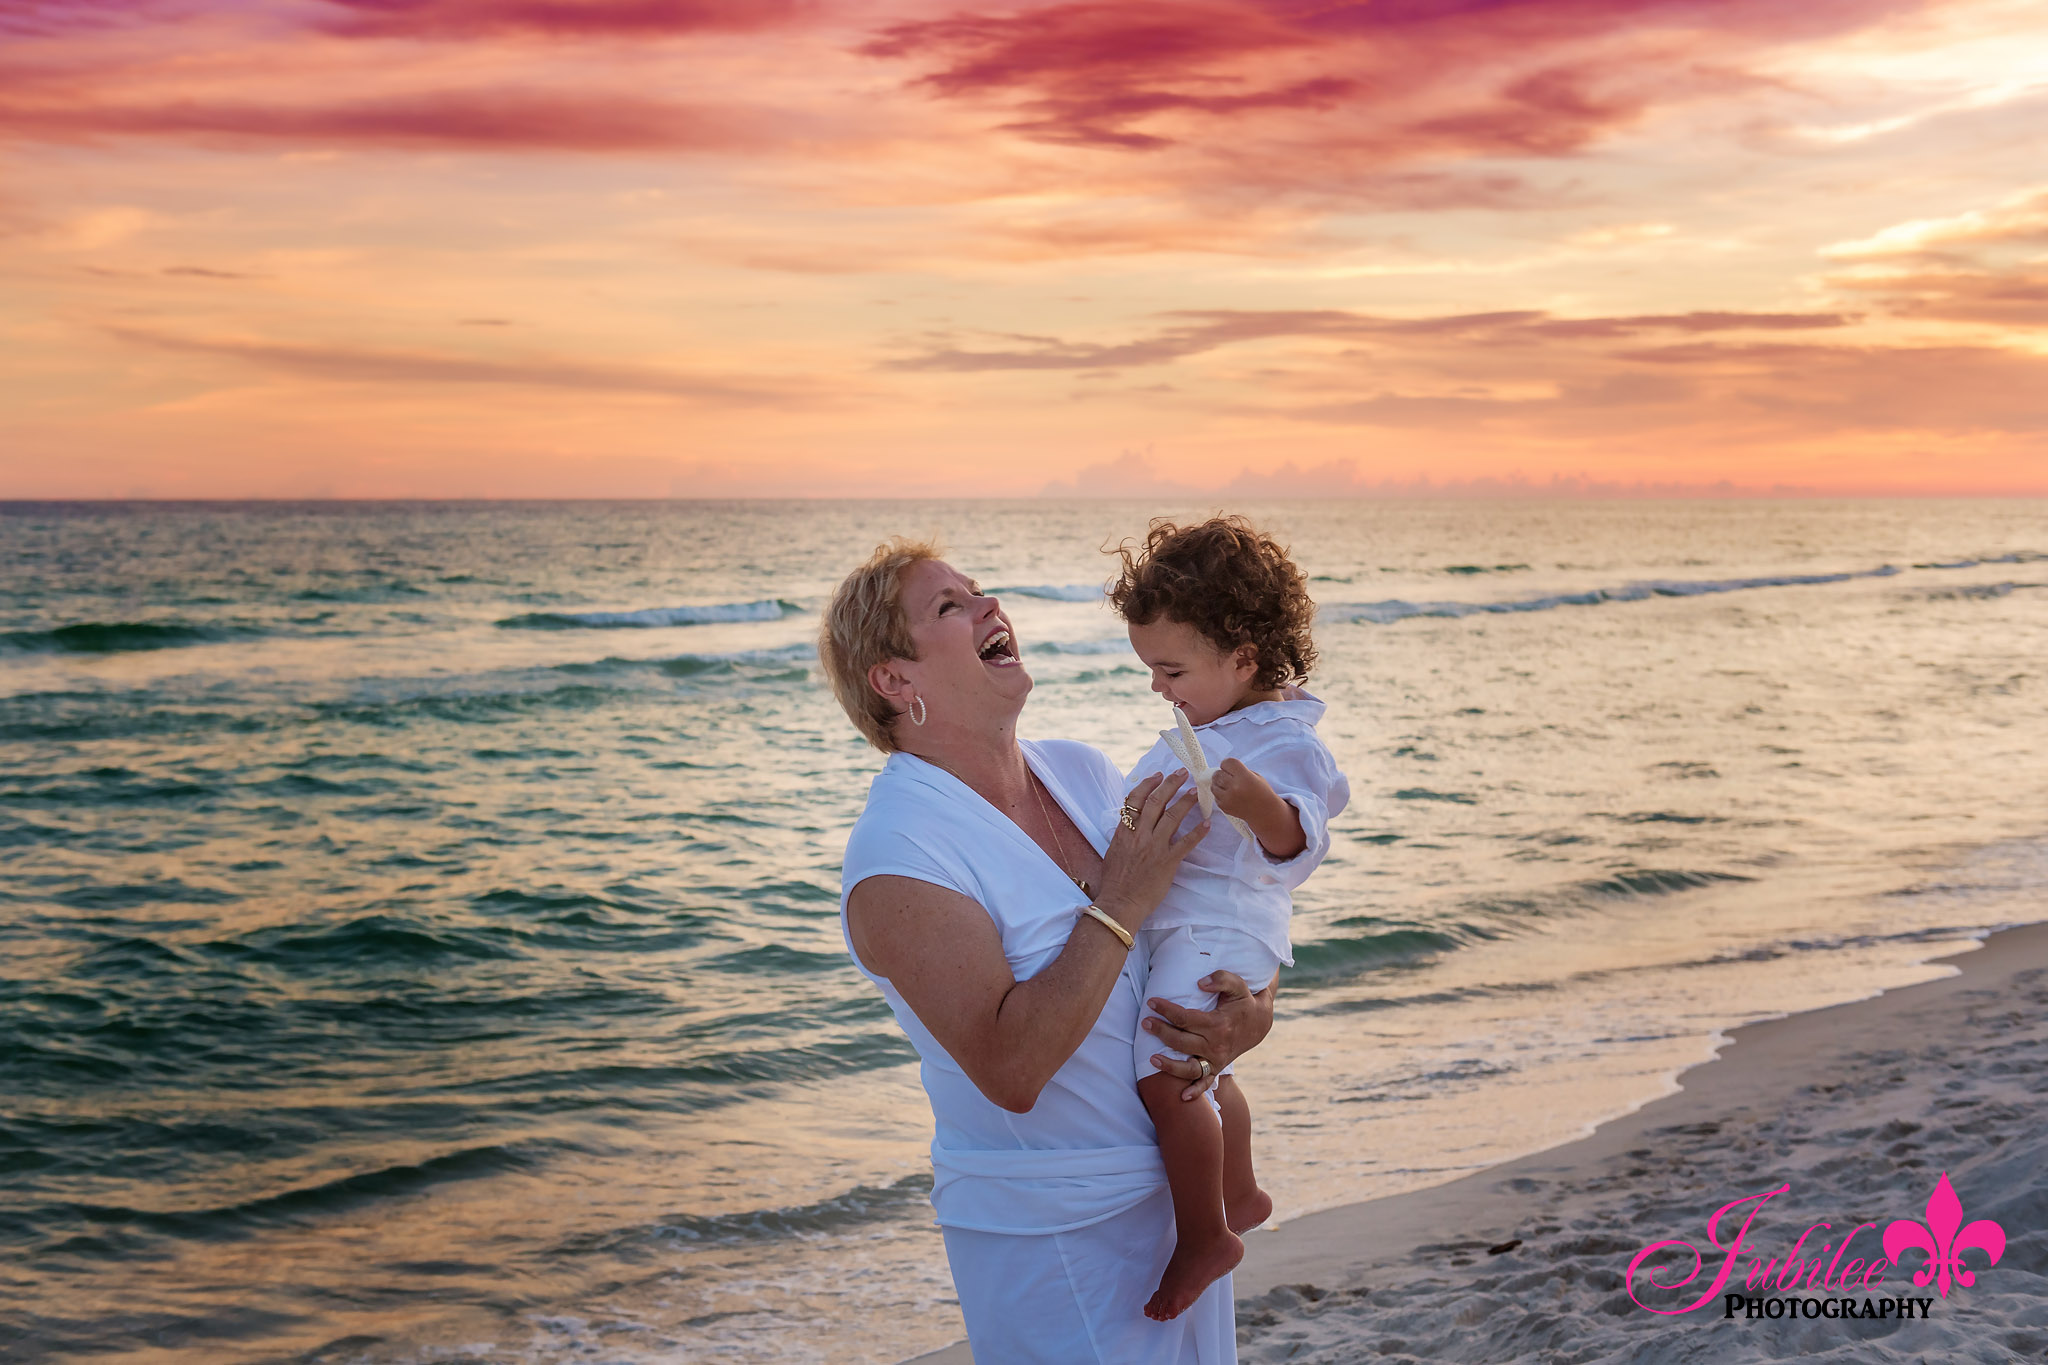 Rosemary_Beach_Family_Photographer_0988